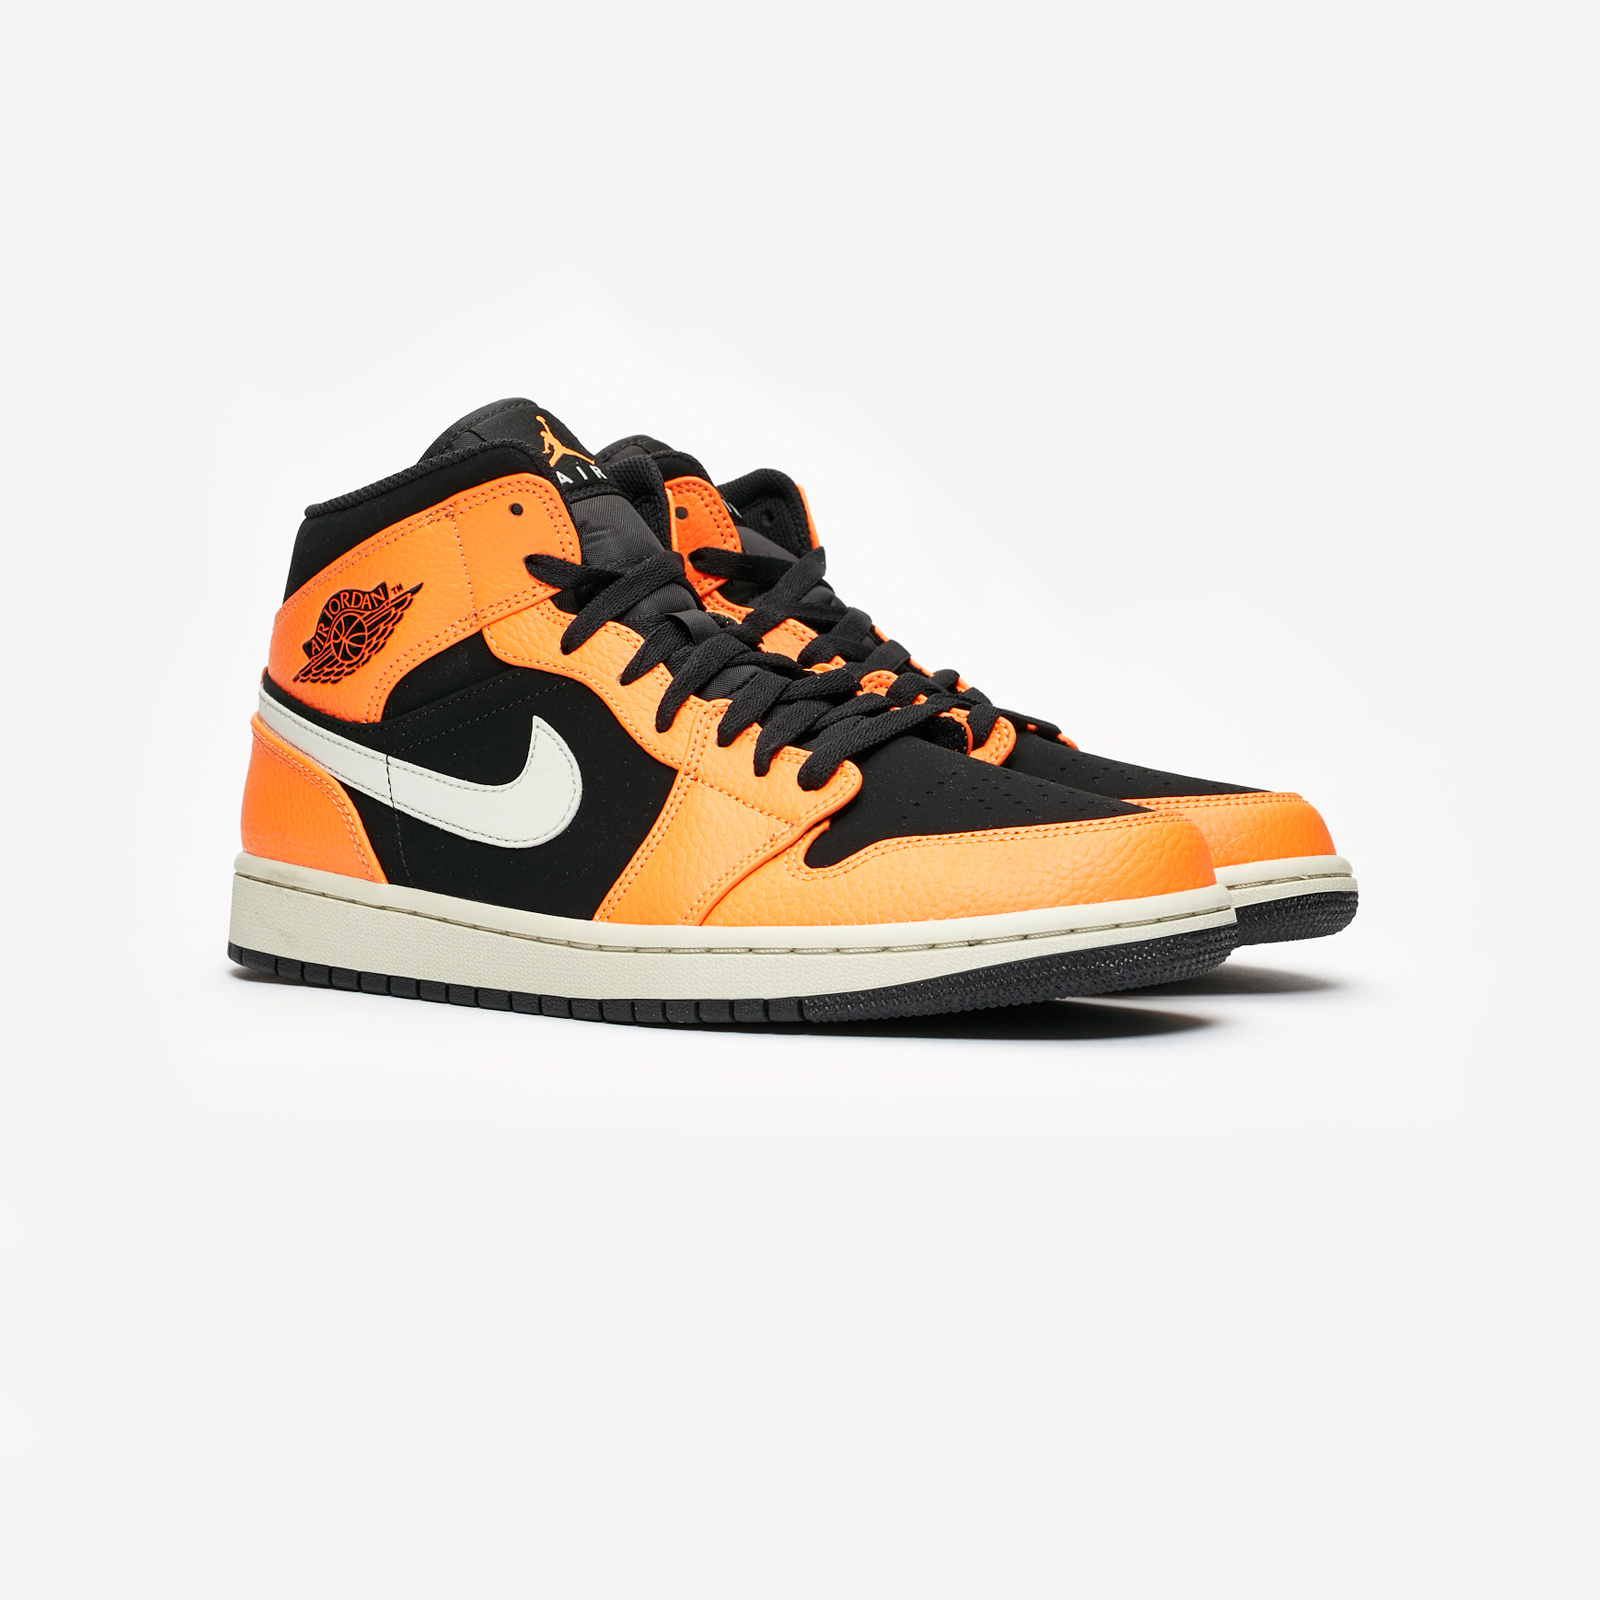 8ea75b55f38279 Jordan Brand Air Jordan 1 Mid - 554724-062 - Sneakersnstuff ...